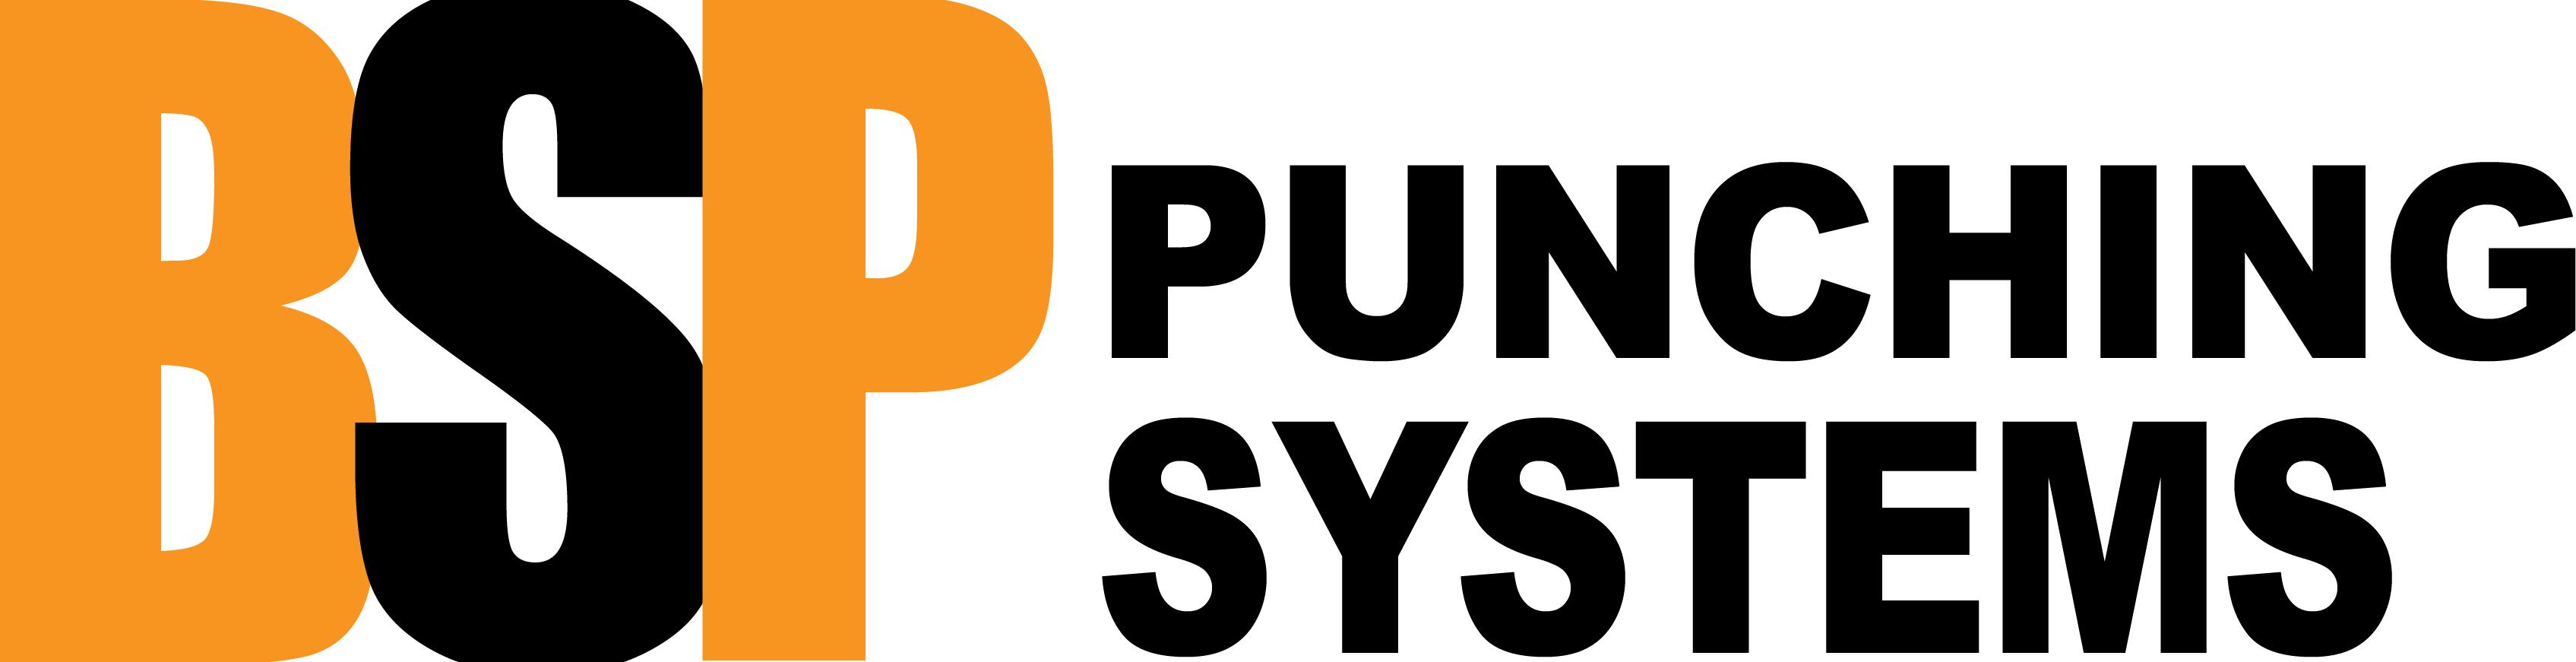 BSP Punching